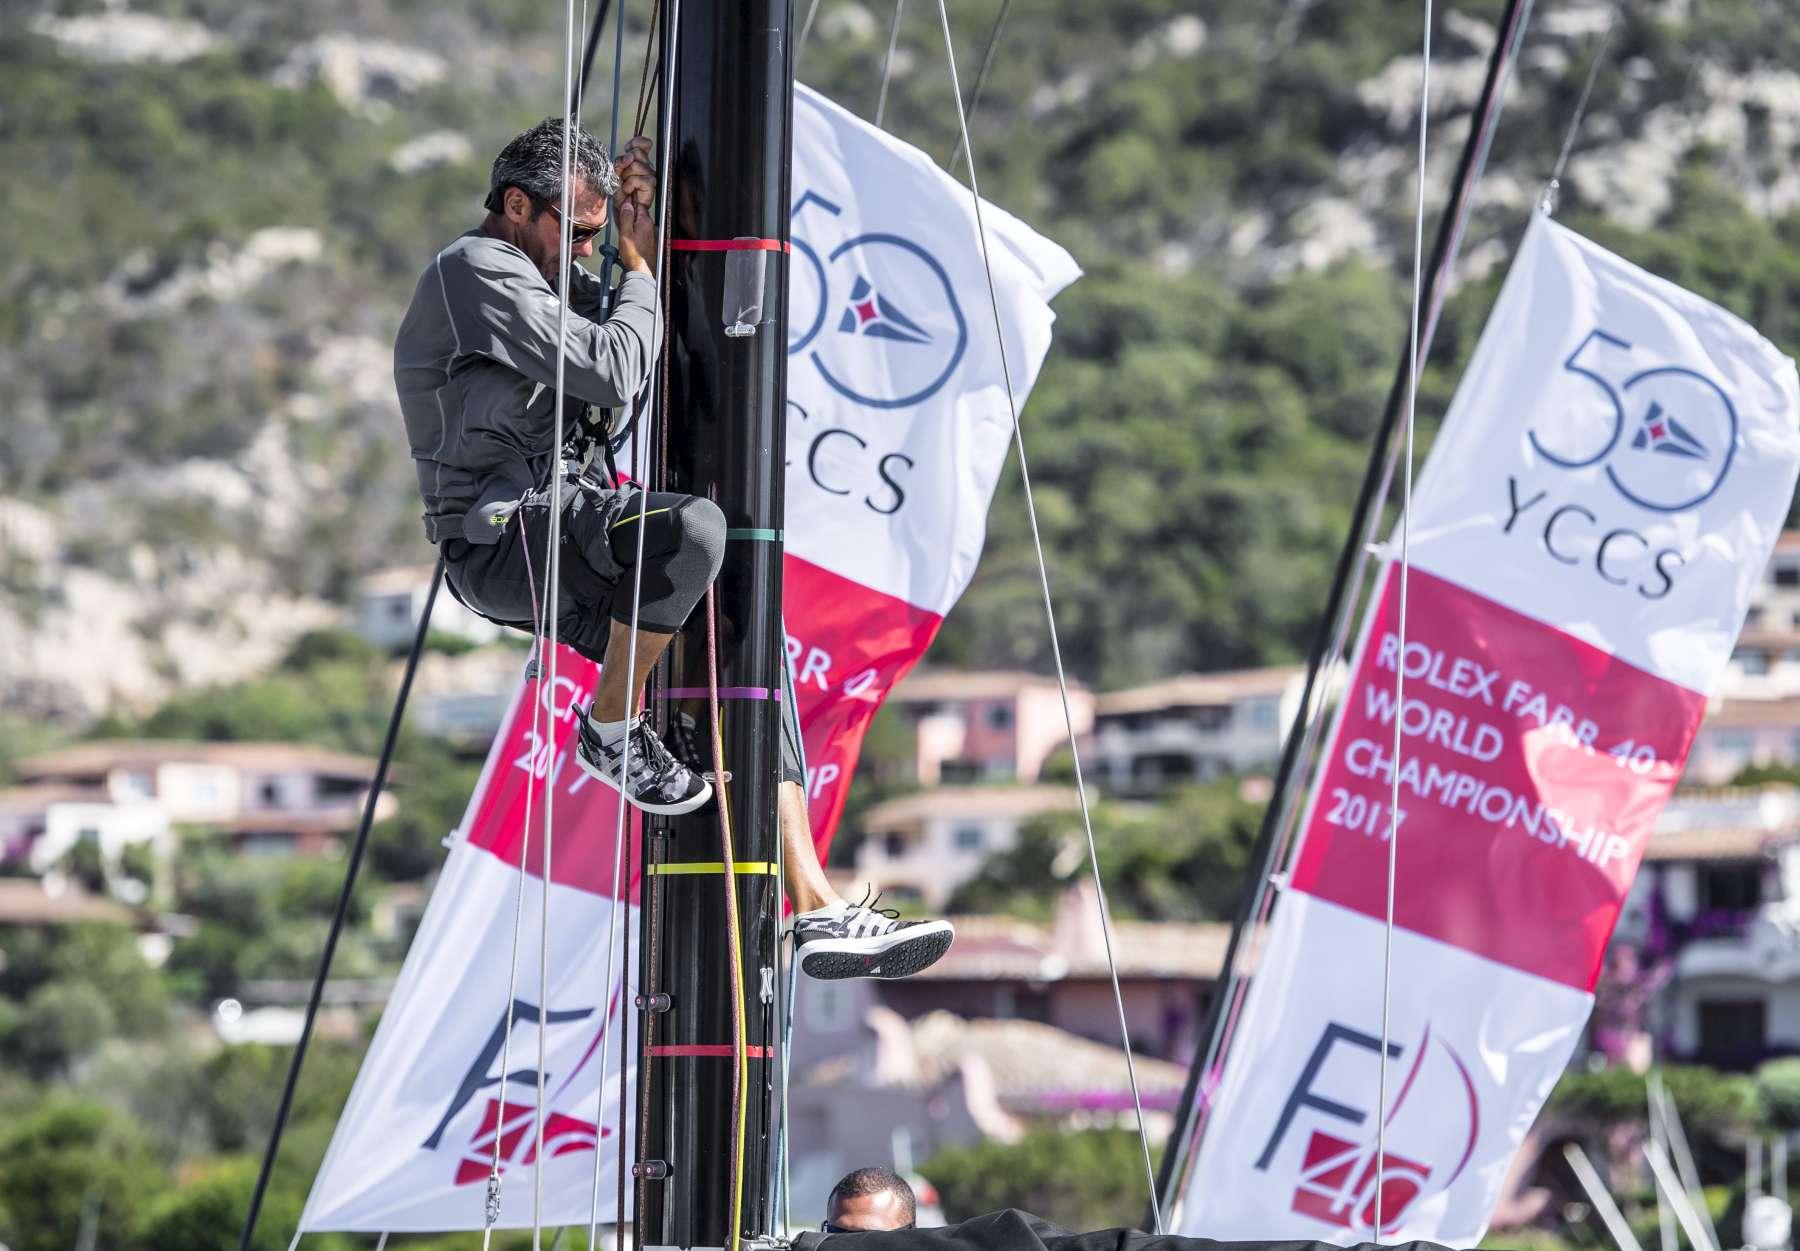 Rolex Farr 40 World Championship: Regate annullate a causa del maestrale - NEWS - Yacht Club Costa Smeralda